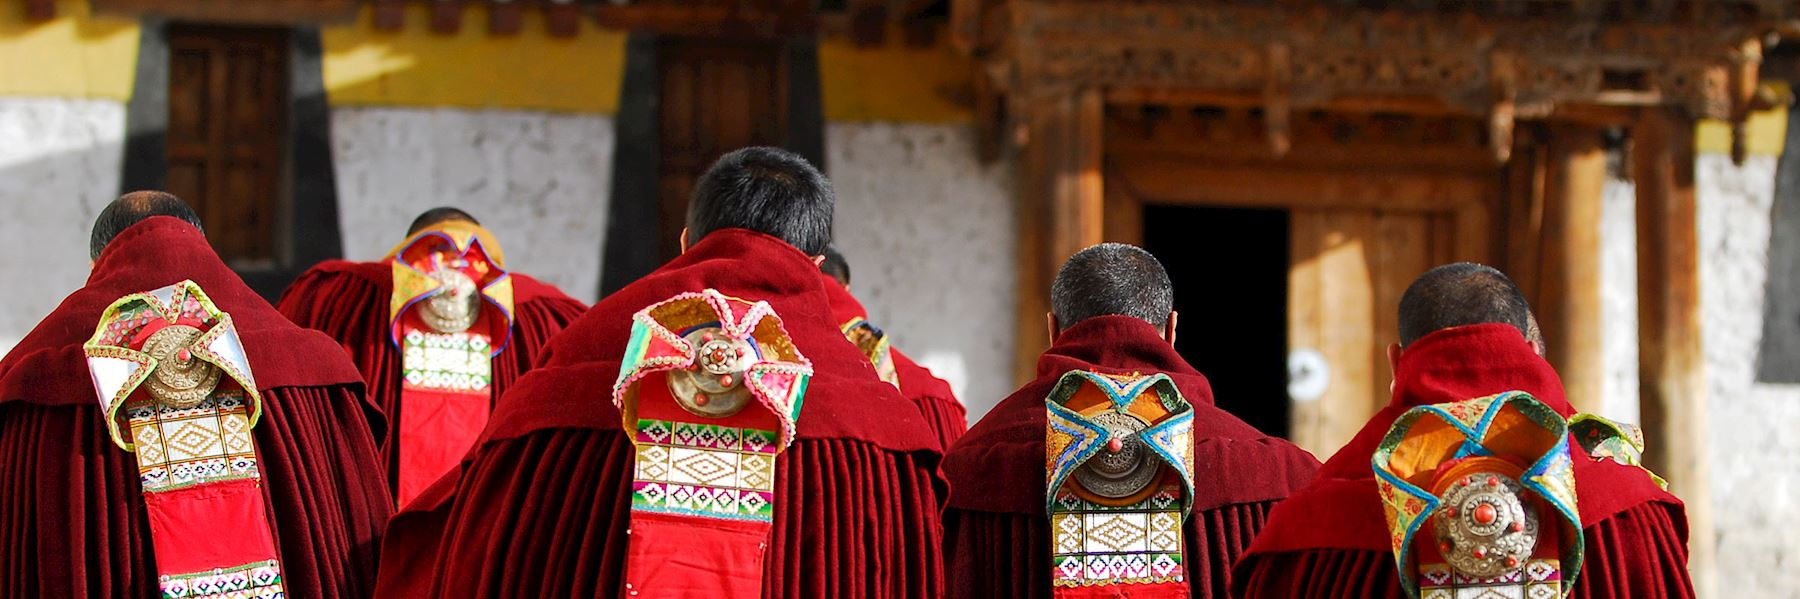 Tibet travel advice